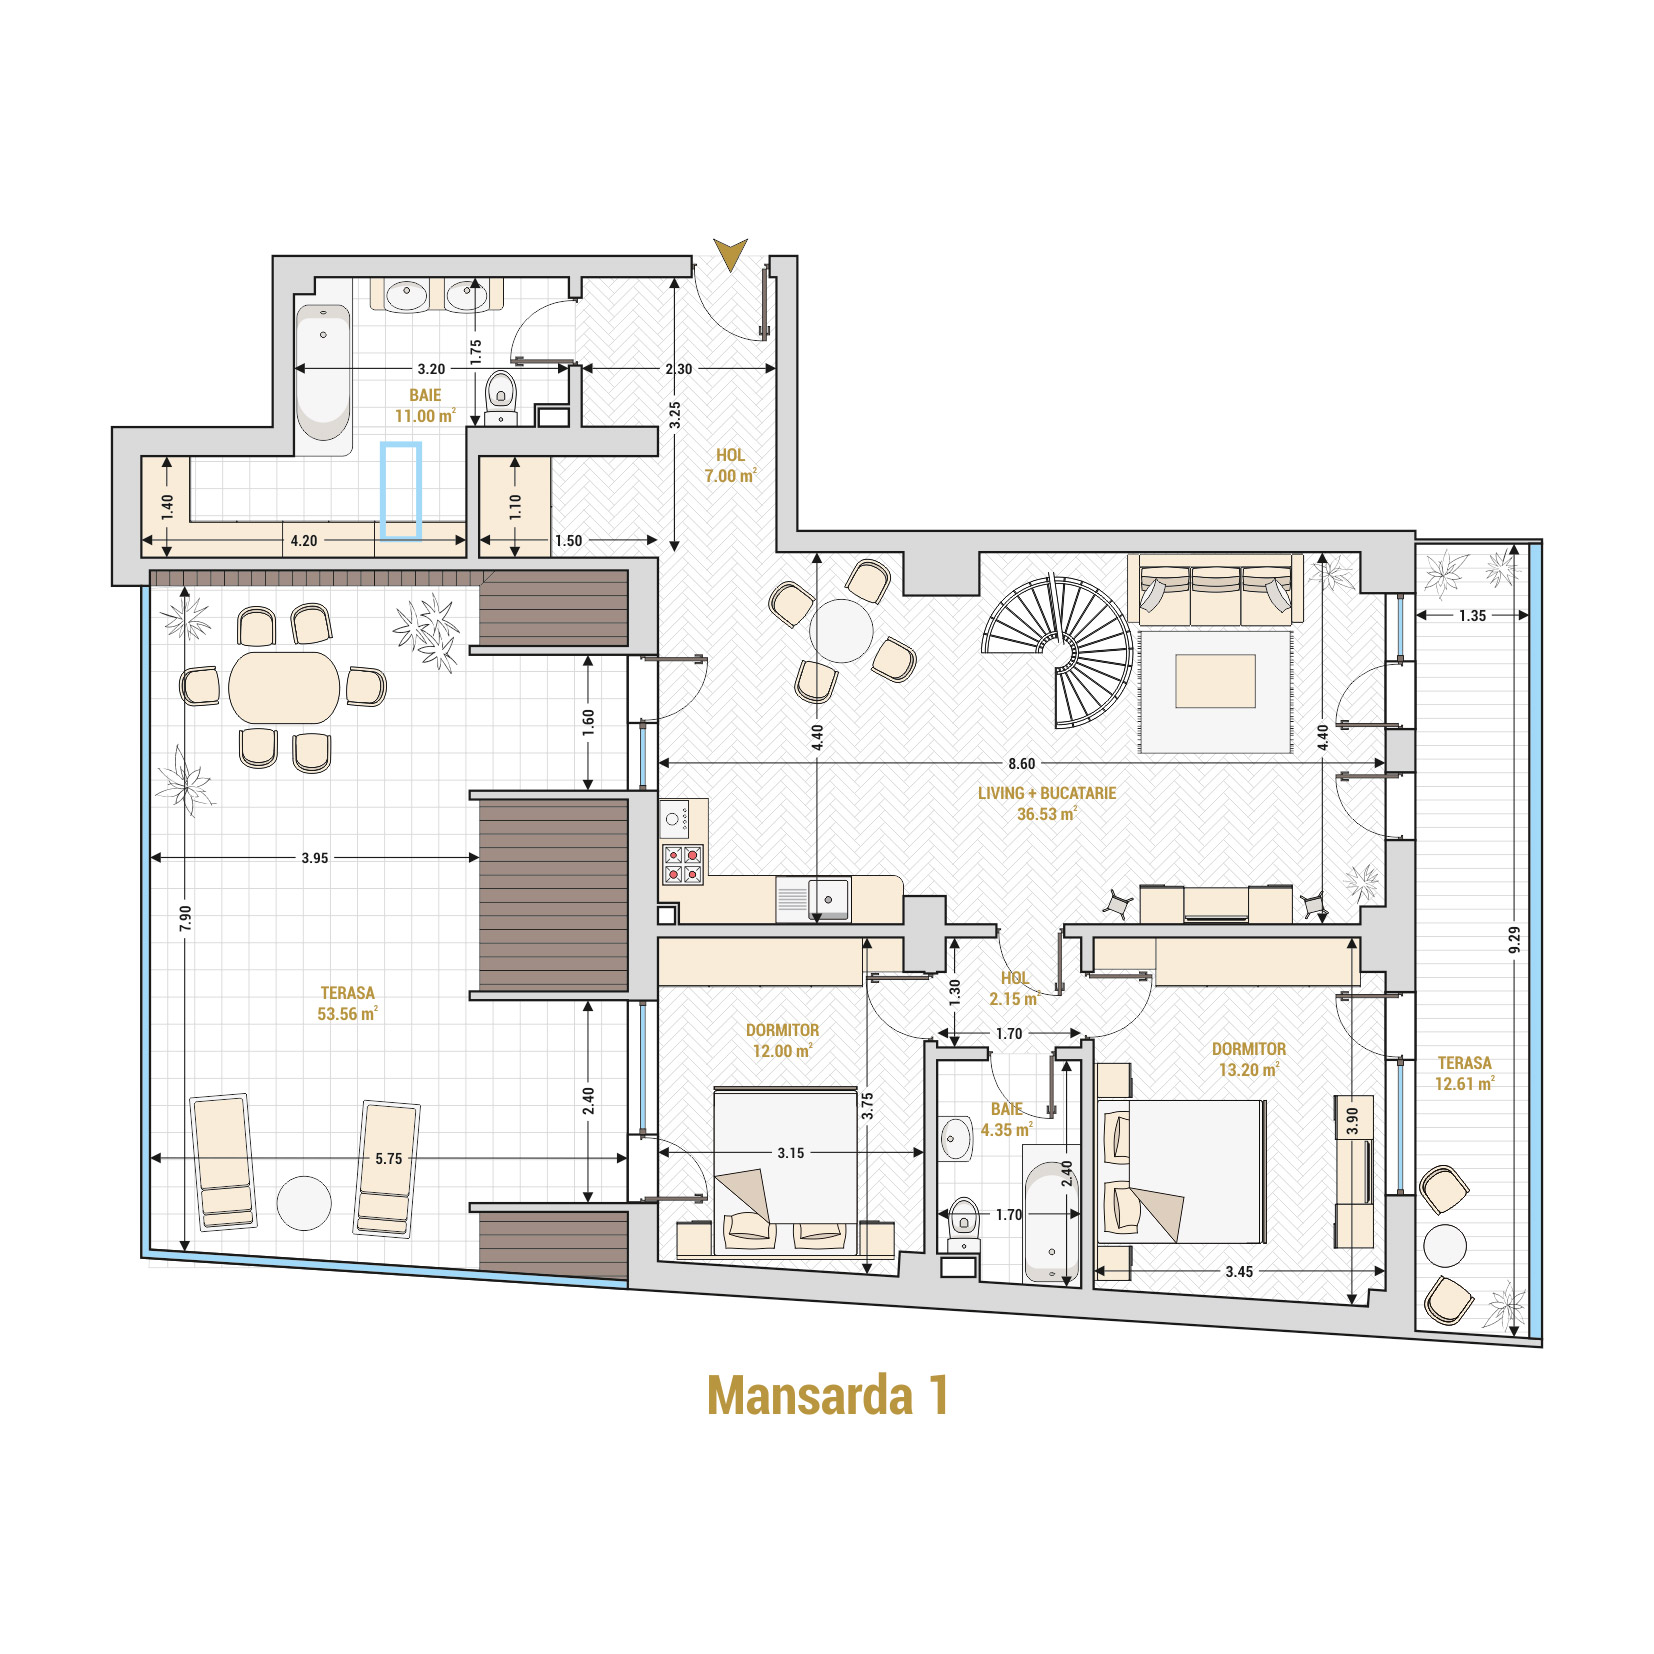 Duplex 5 camere de vanzare Bucuresti - Catedral Residence - Marriott, Piata Unirii, 13 Septembrie, Izvor - Tip 1 - T2A - A